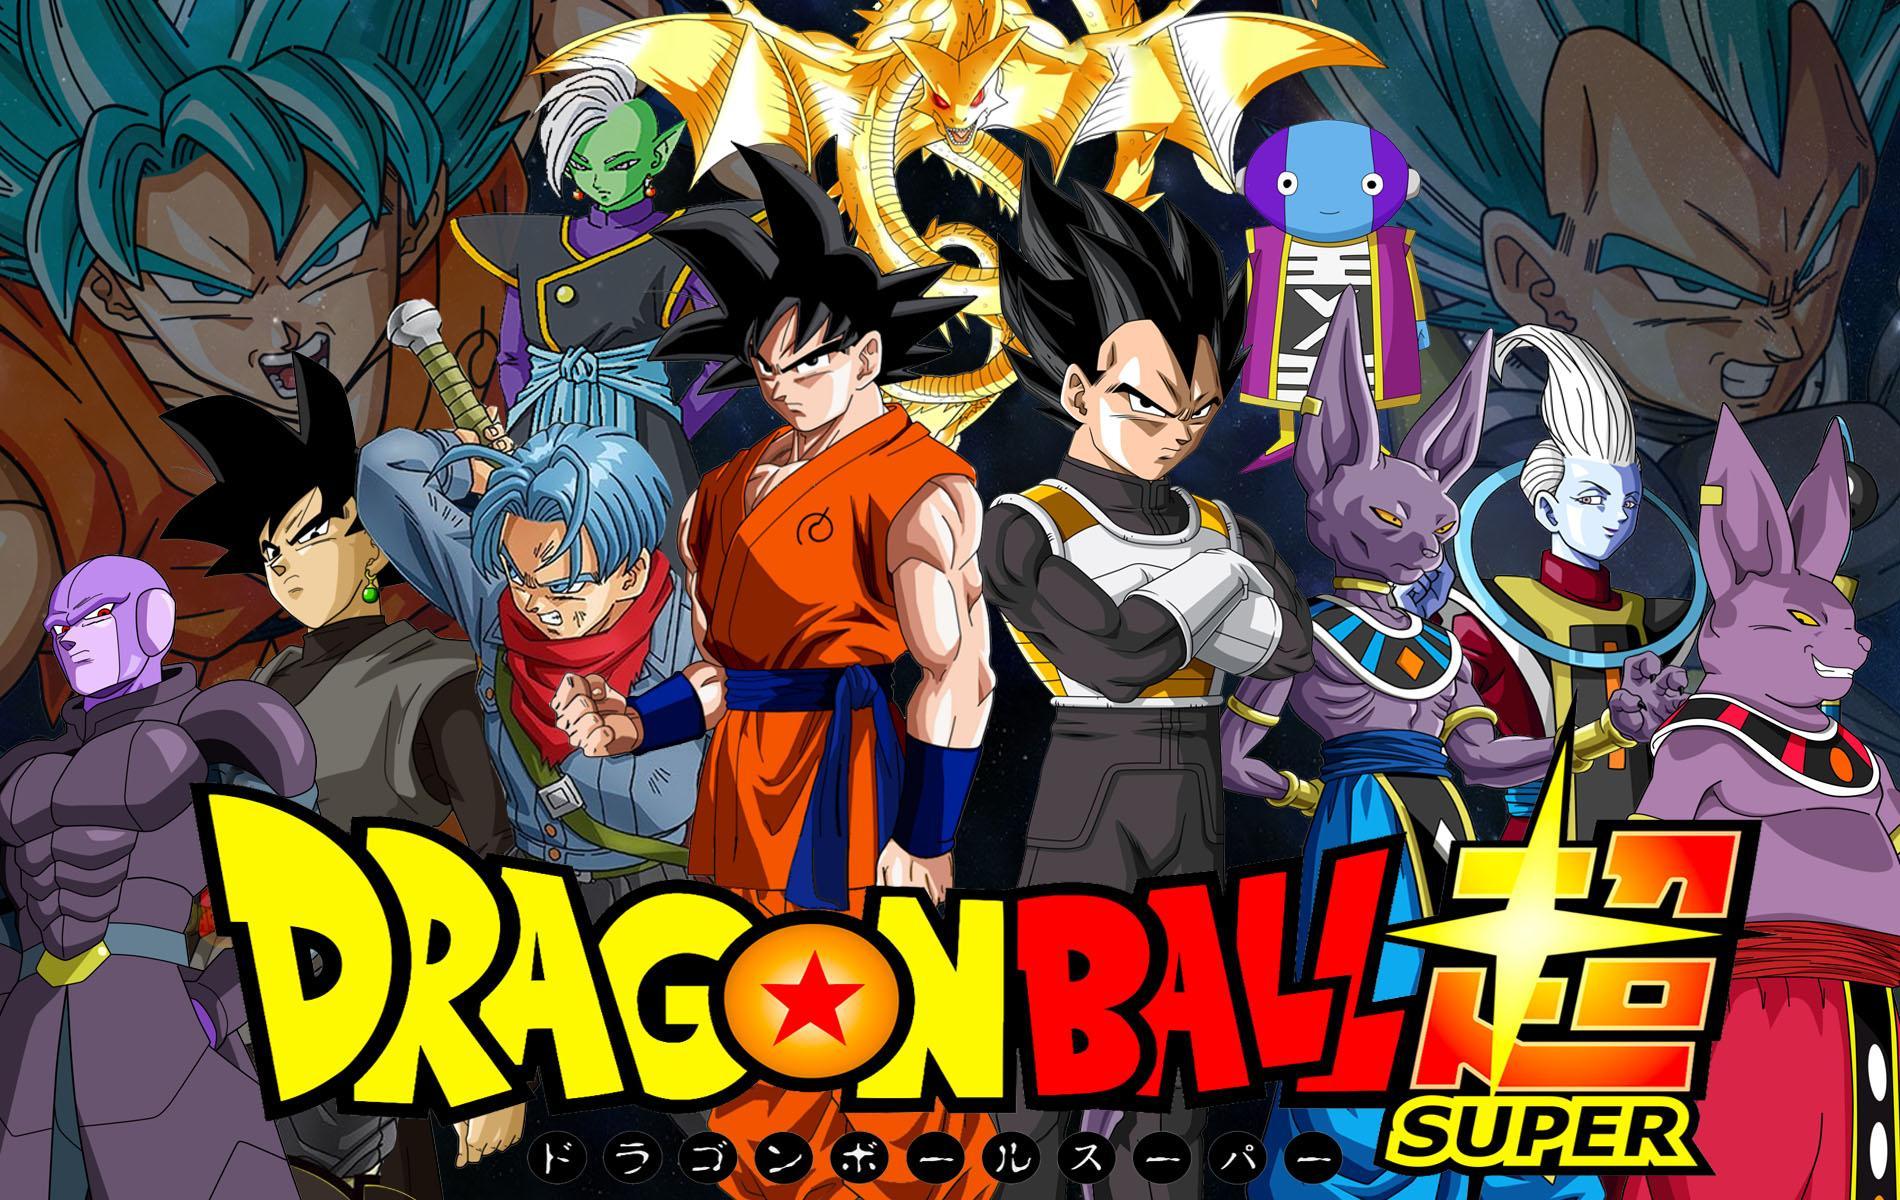 Dragon Ball Super A-T-Il Tué Dragon Ball ? - Dossier Série destiné Dessin Animé De Dragon Ball Z